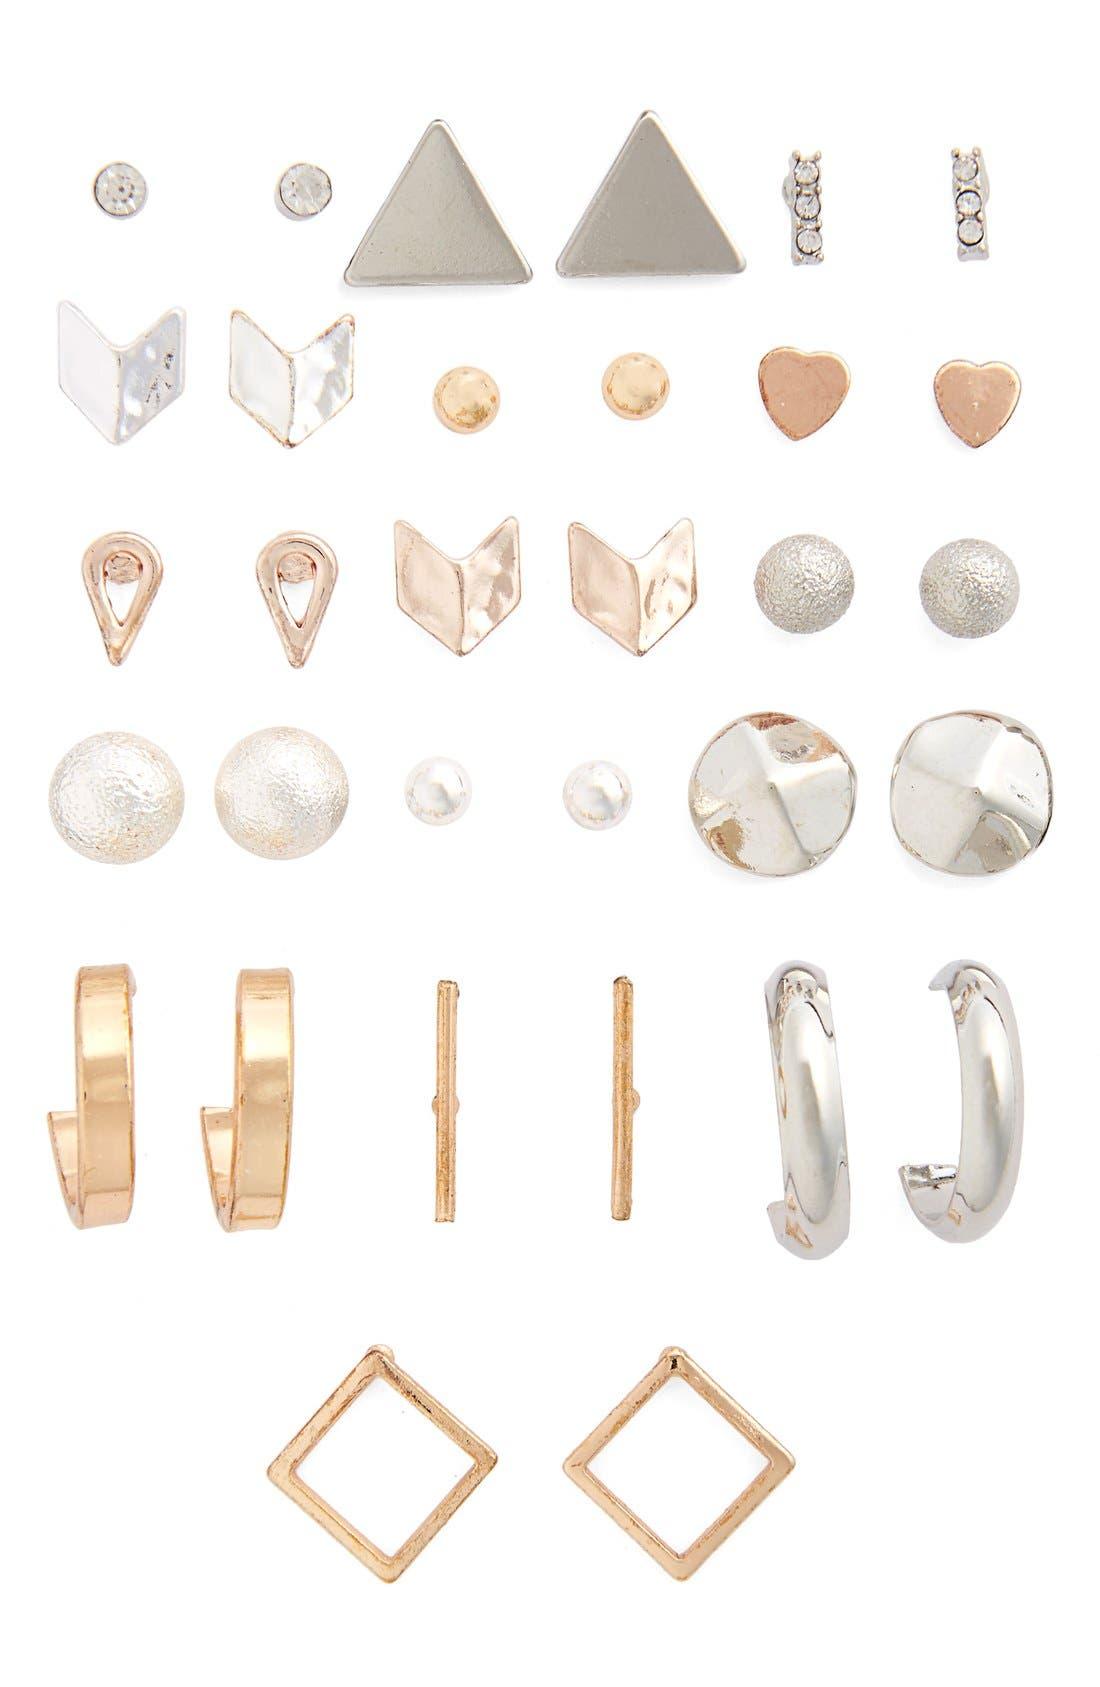 16-Pack Stud Earrings,                             Main thumbnail 1, color,                             041